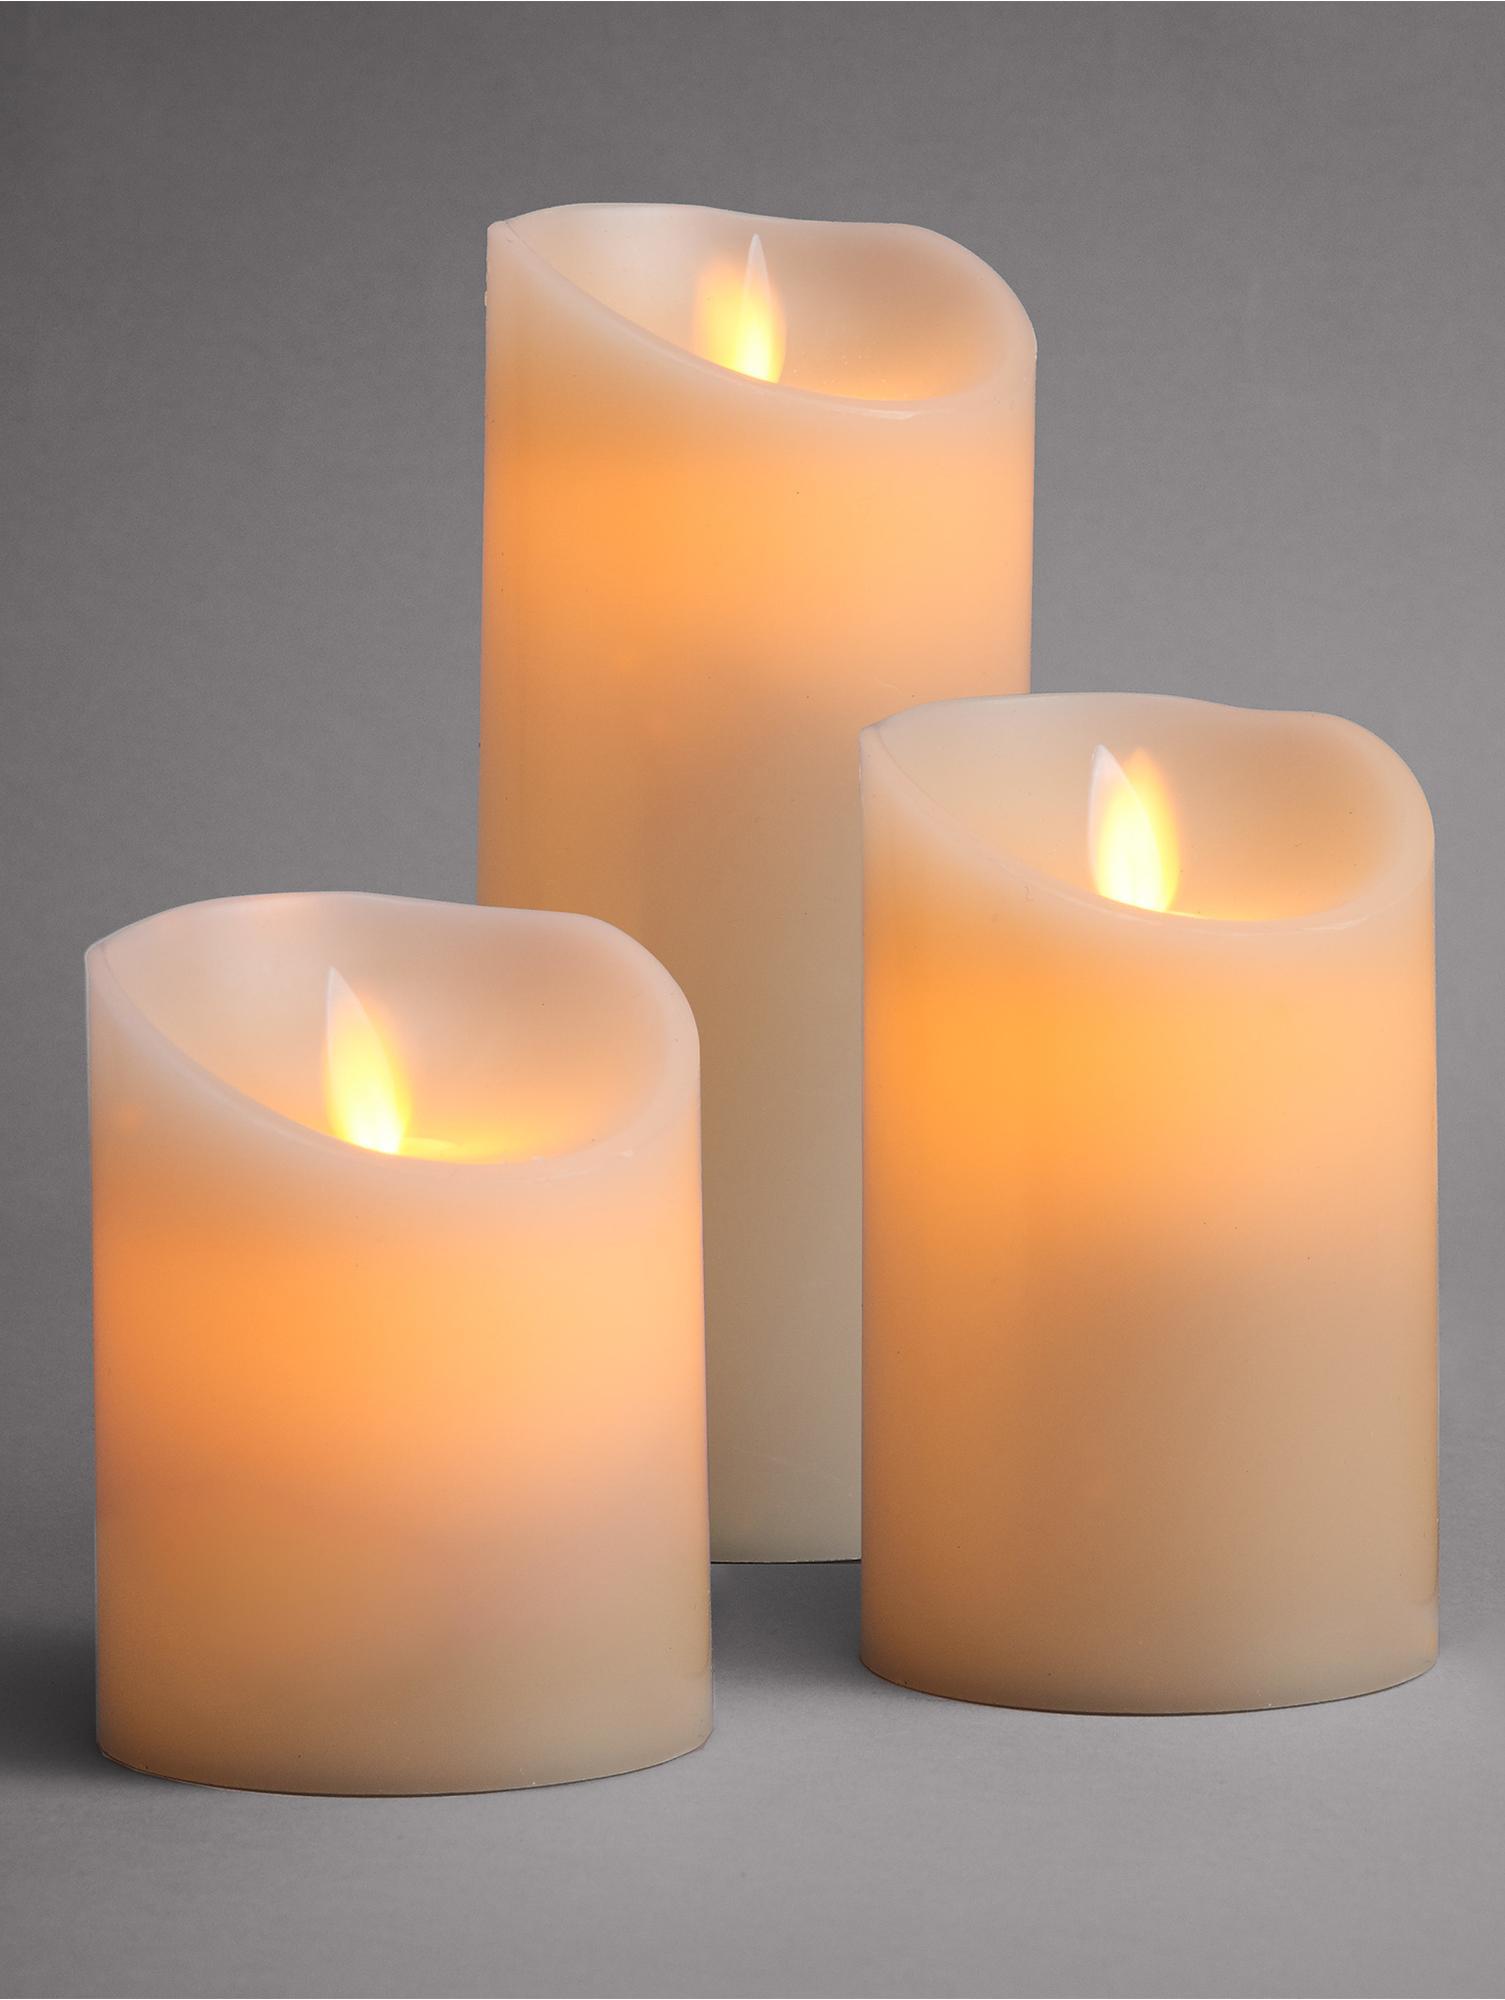 Candela a LED Glowing Flame 2 pz, Paraffina, materiale sintetico, Crema, Diverse dimensioni